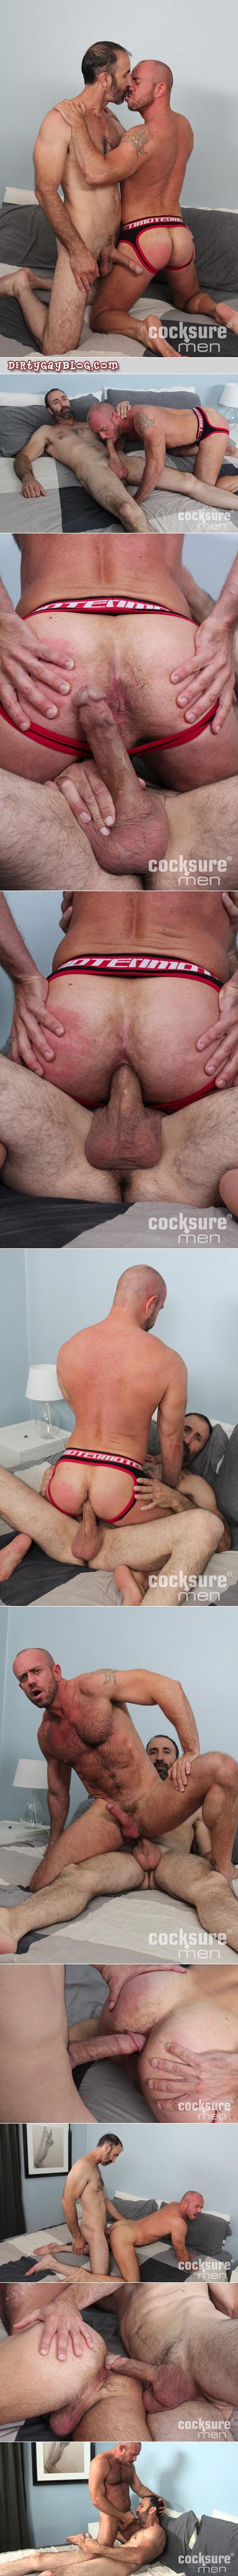 Slender hairy Daddy barebacks his bottom boi in a jockstrap.